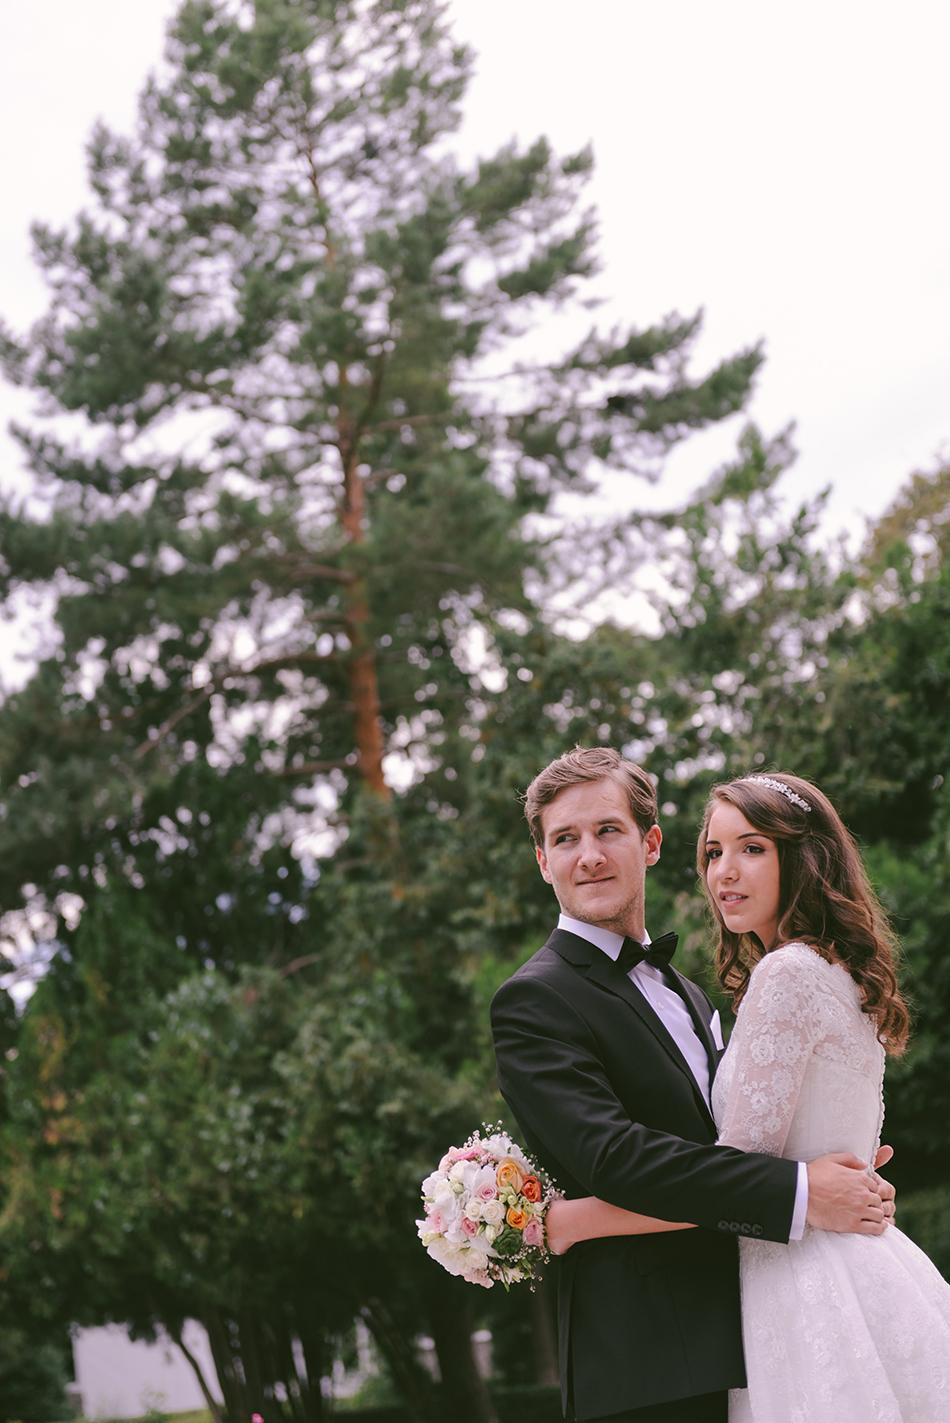 AD Passion Photography | sami-ela-lela-nunta-domeniu-lupas-arad_0050 | Adelin, Dida, fotograf profesionist, fotograf de nunta, fotografie de nunta, fotograf Timisoara, fotograf Craiova, fotograf Bucuresti, fotograf Arad, nunta Timisoara, nunta Arad, nunta Bucuresti, nunta Craiova